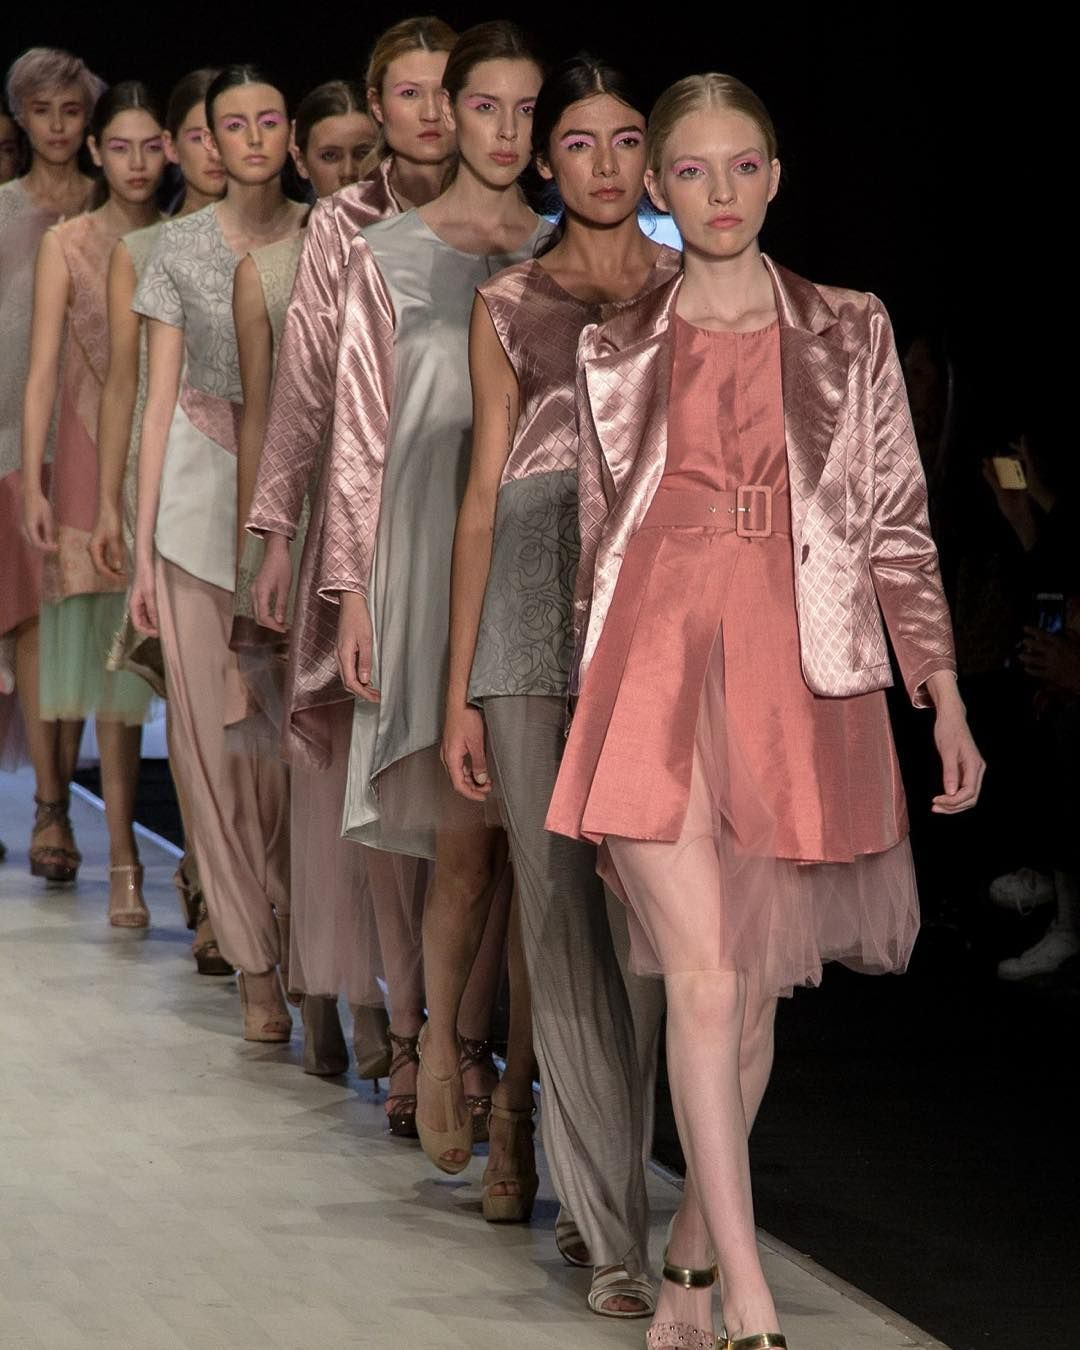 Código secreto #fashion #runway #códigosecreto #palepink #palecolors #im64 #intermoda #allierjphotography #runway #models #fashionistas #fashionphotography by allieph__